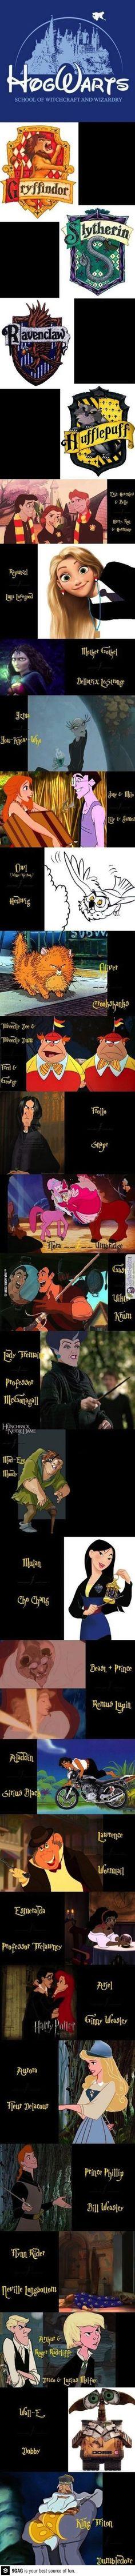 Hogwarts in a parallel Disney world